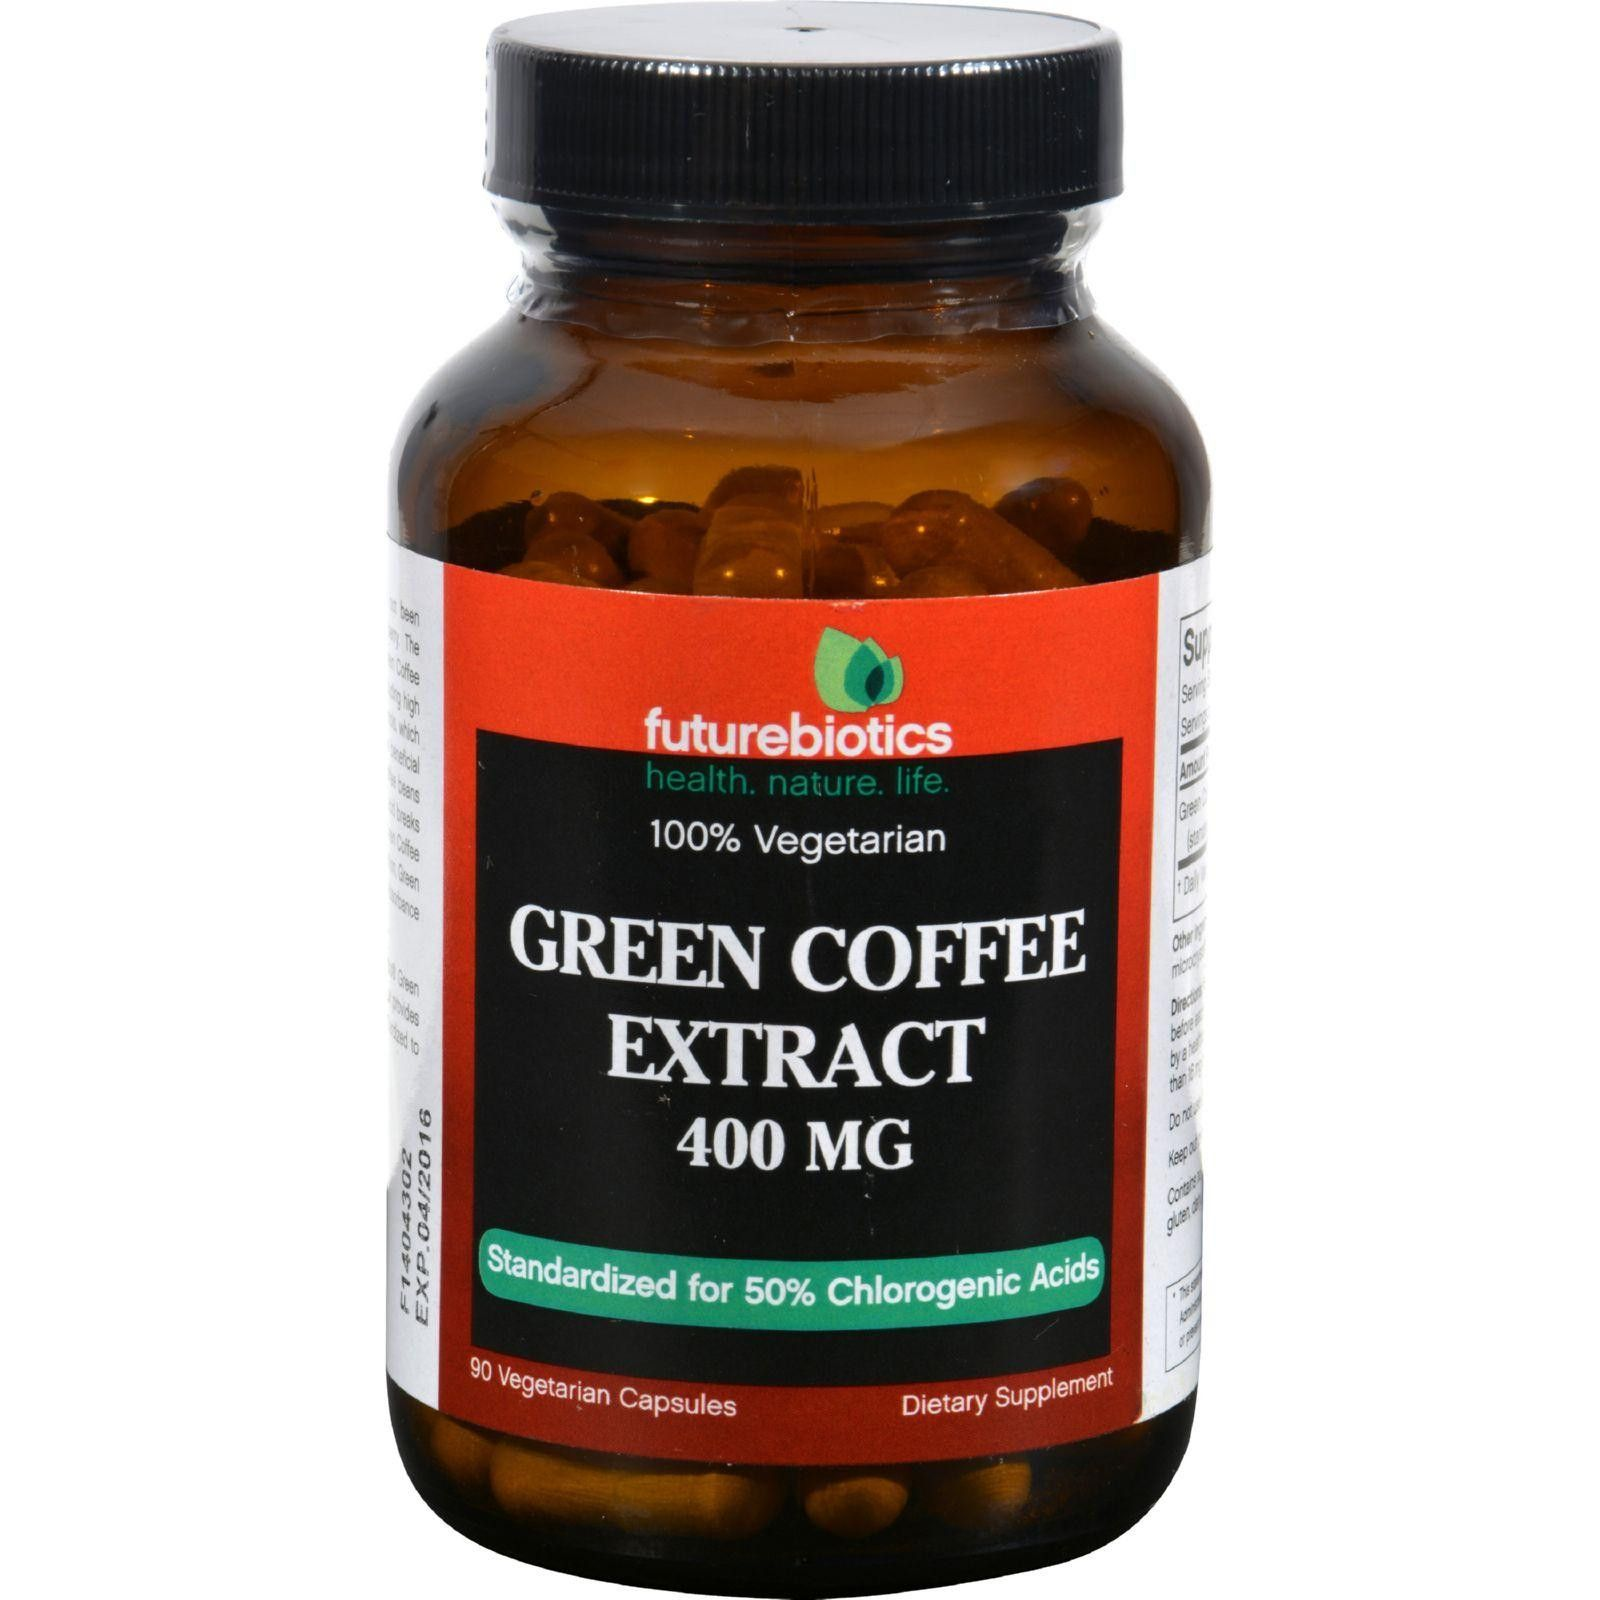 Futurebiotics Green Coffee Extract 400 Mg 90 Vegetarian Capsules Capsule Pure Arabica Organic 60 Caps